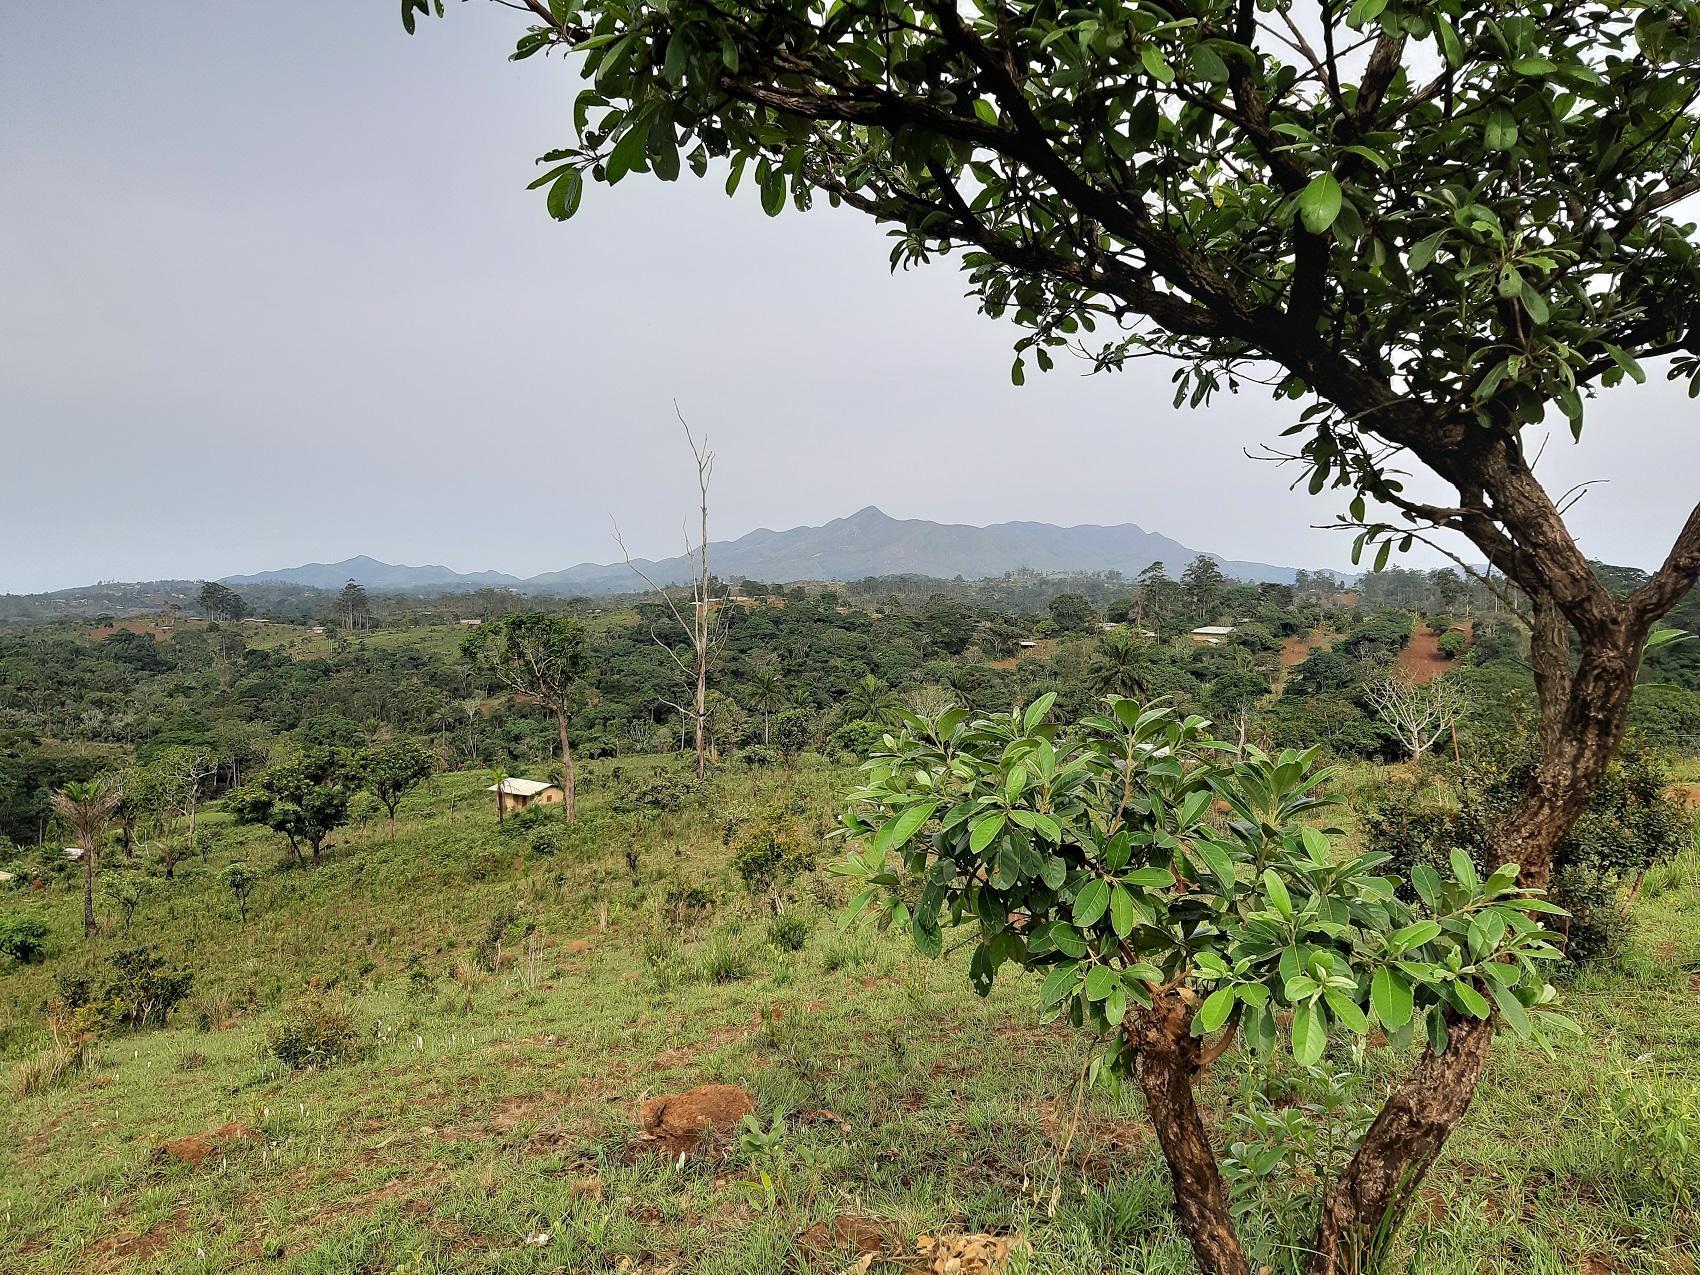 Monts batchingou